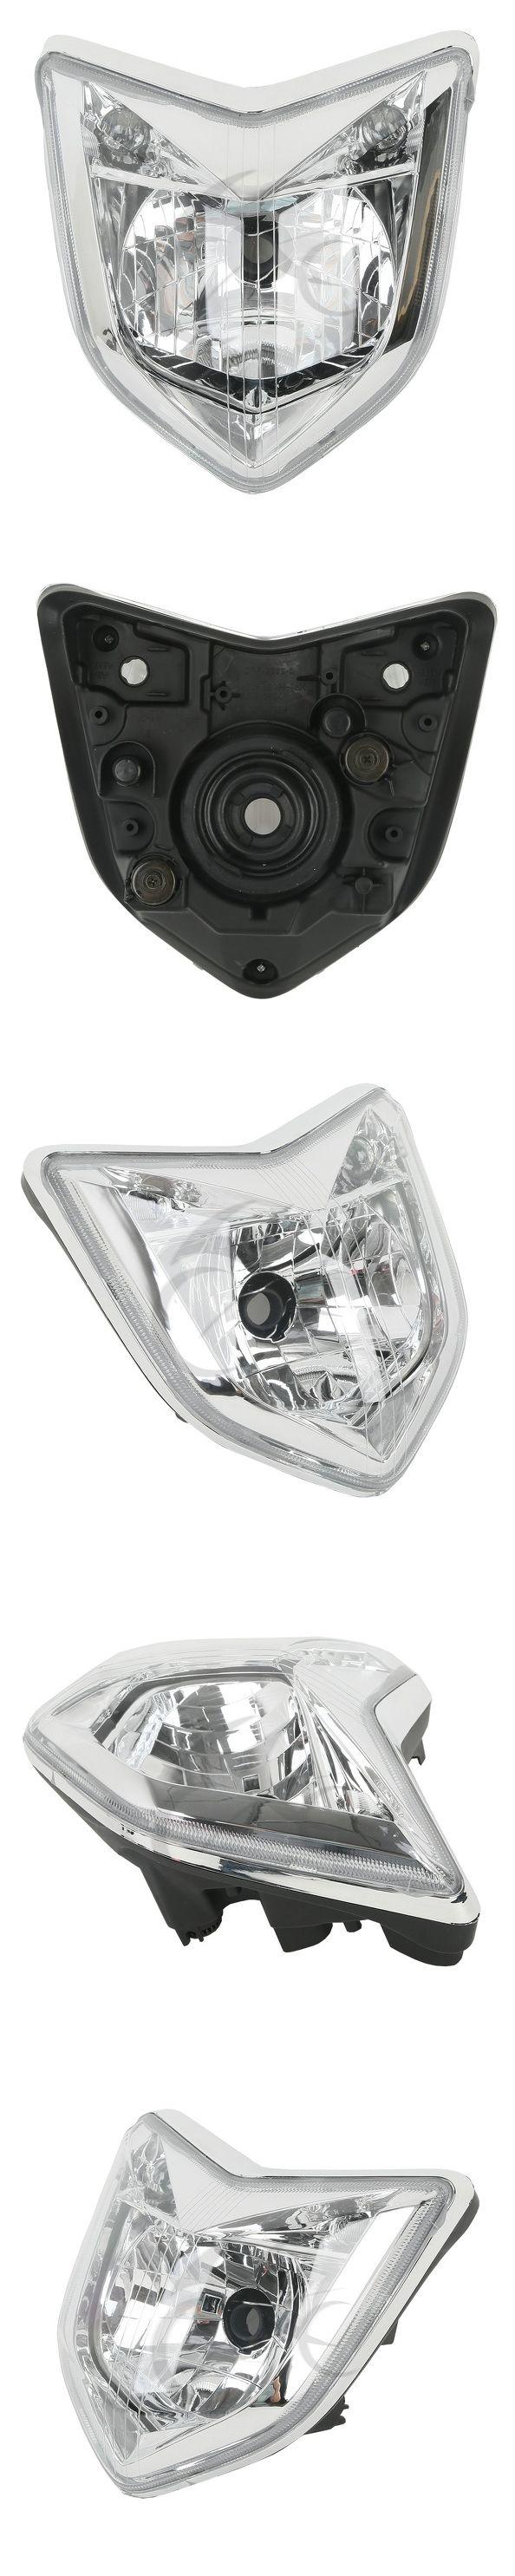 Motorcycle Headlight Headlamp Front Light Lamp For Yamaha FZ1 Fazer 2006-2009 07 08 ABS Plastic